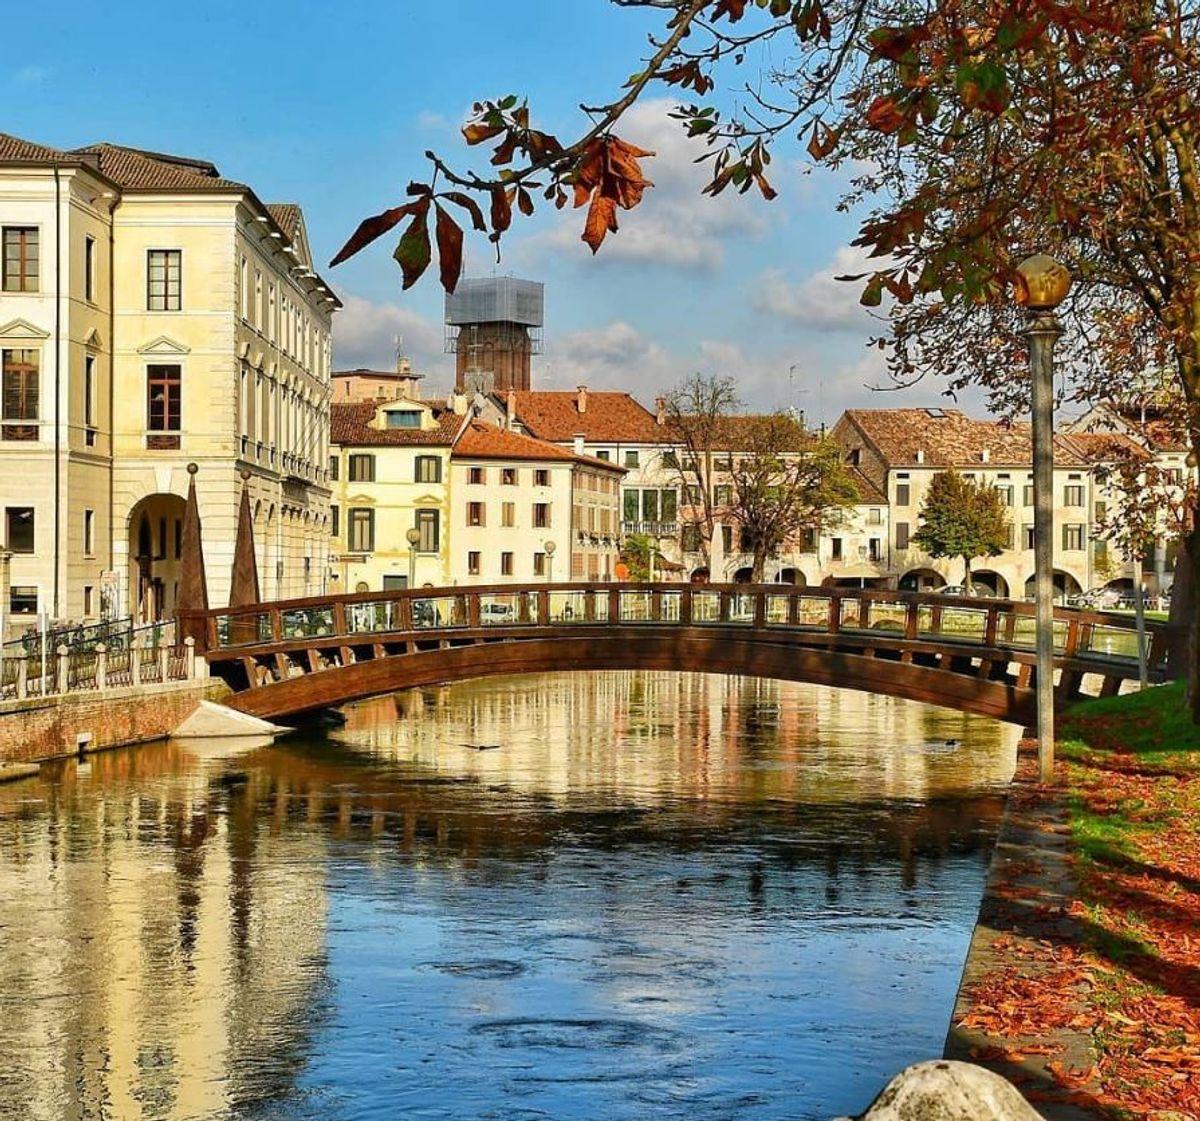 event-Caccia al Tesoro a Treviso, tra Arte e Acqua